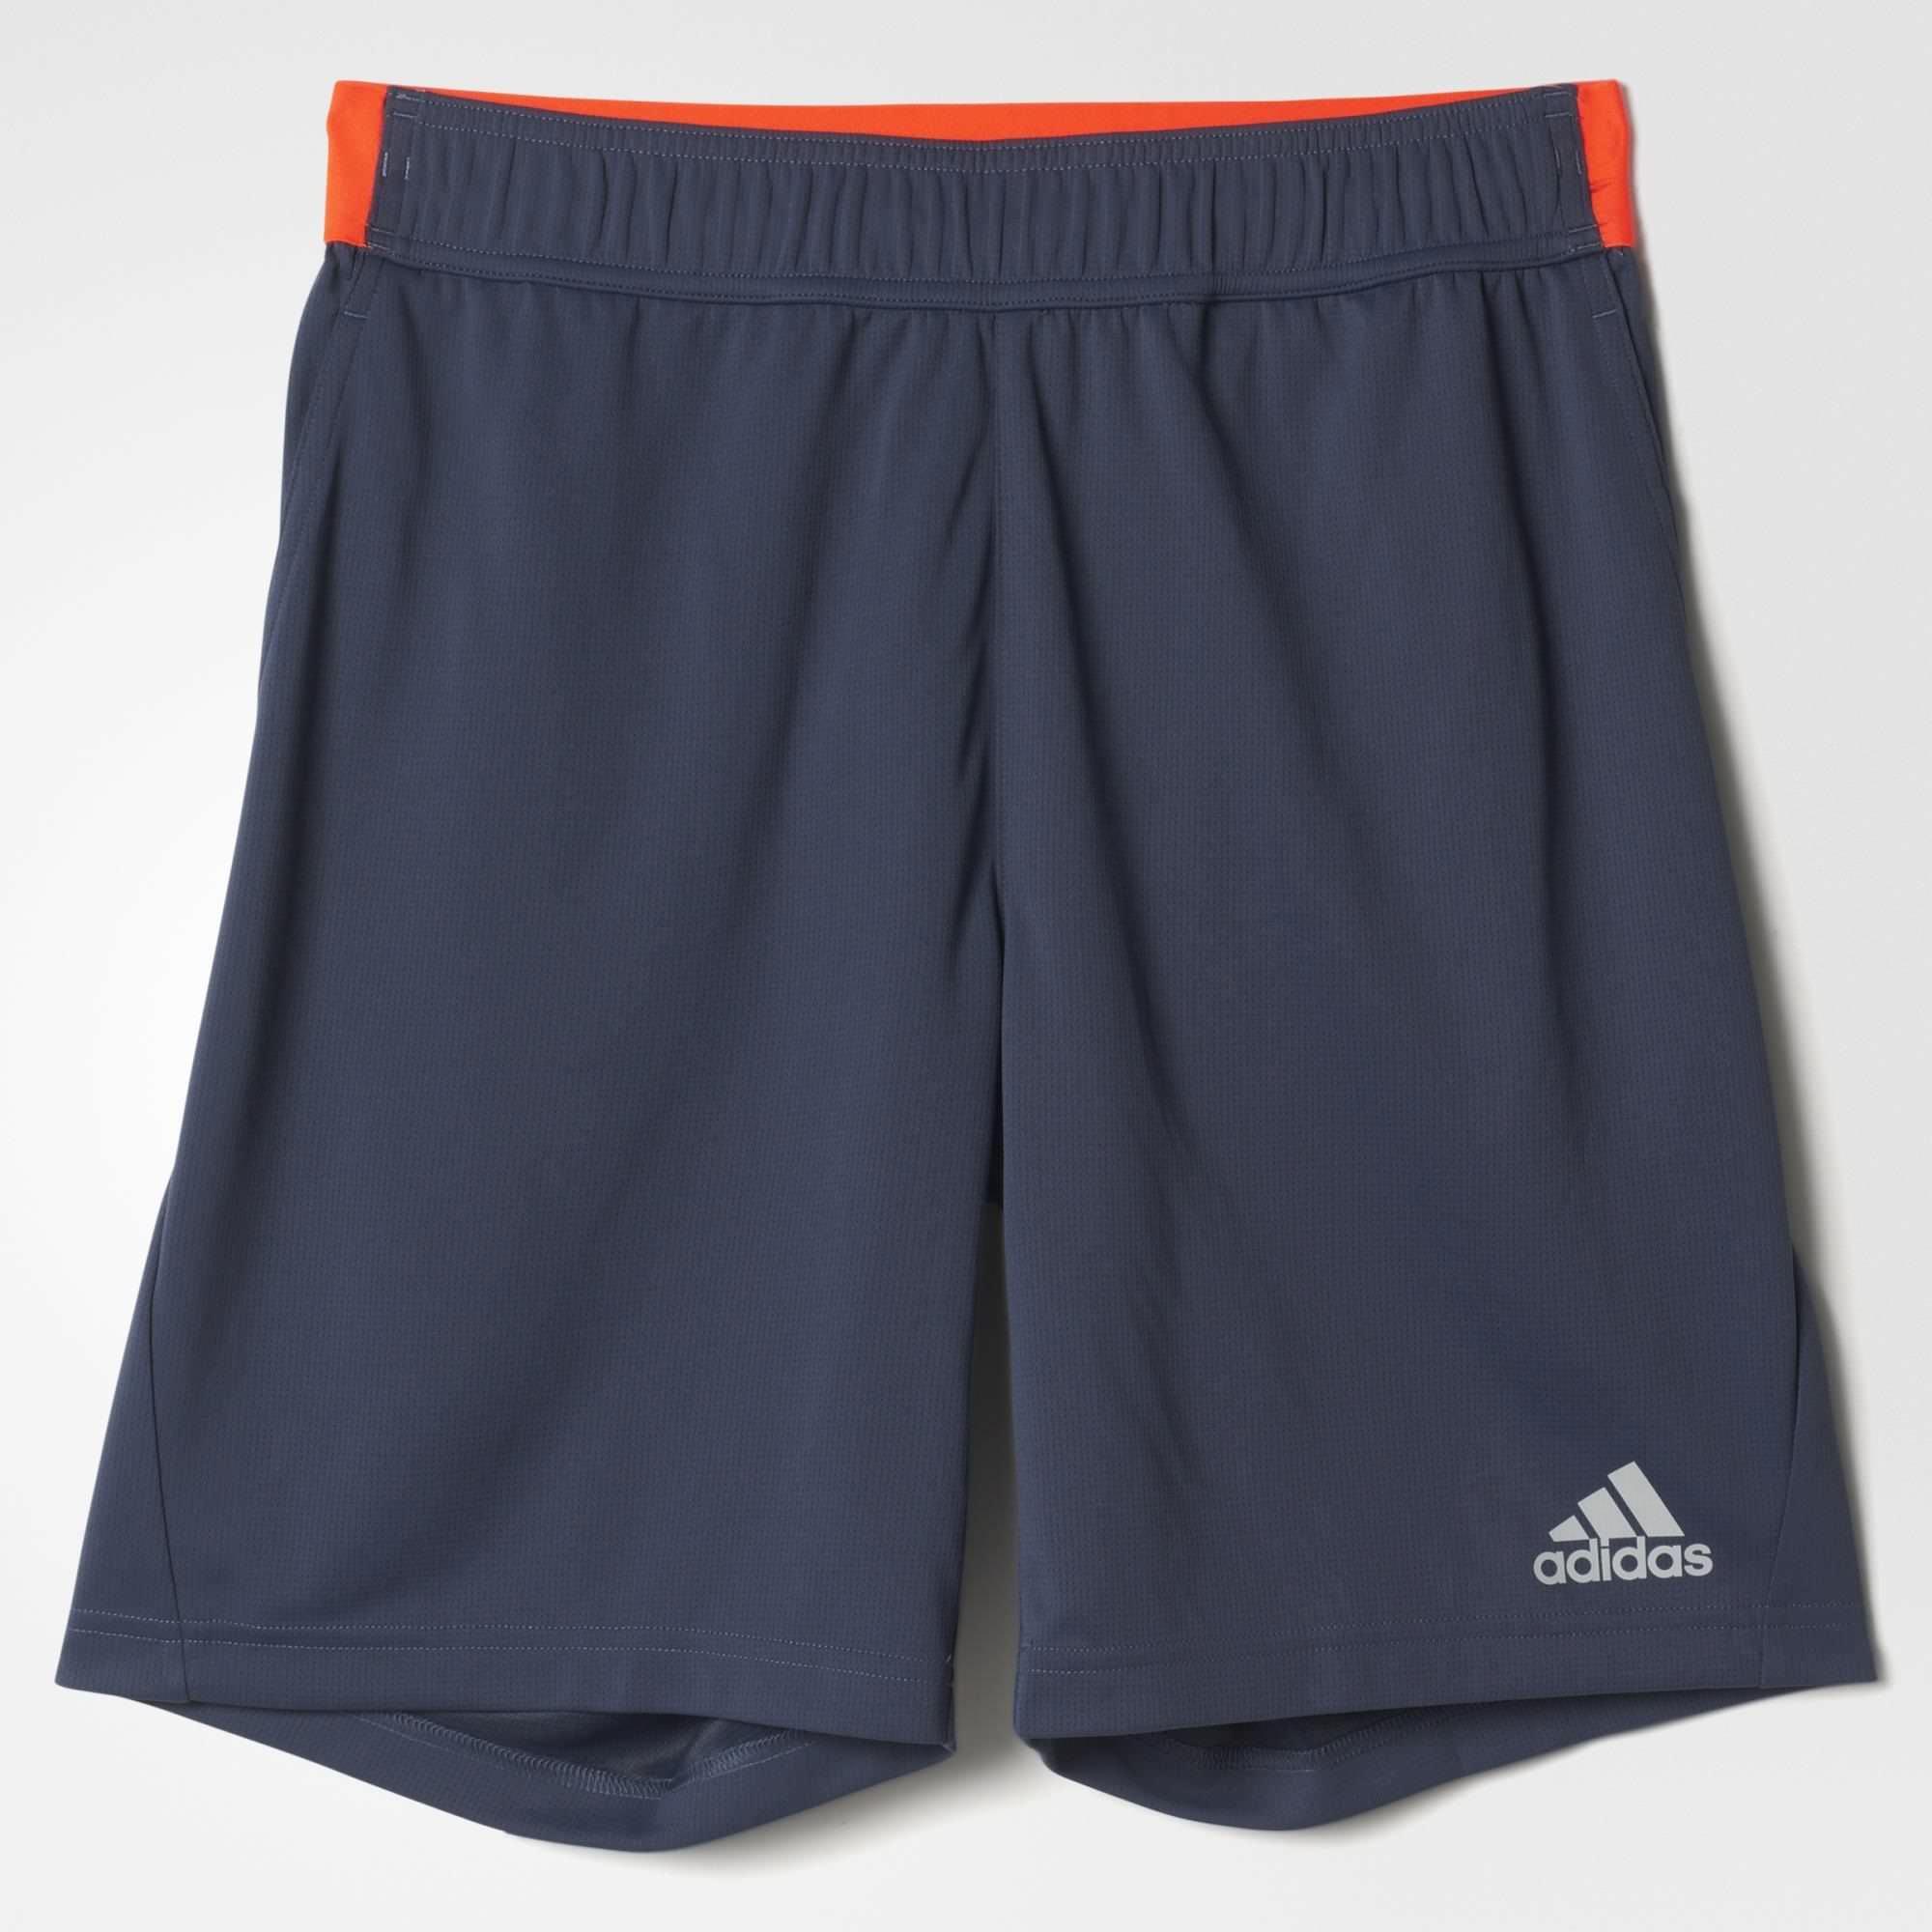 Adidas Mens Barricade Uncontrol Climachill Shorts - Midnight Grey